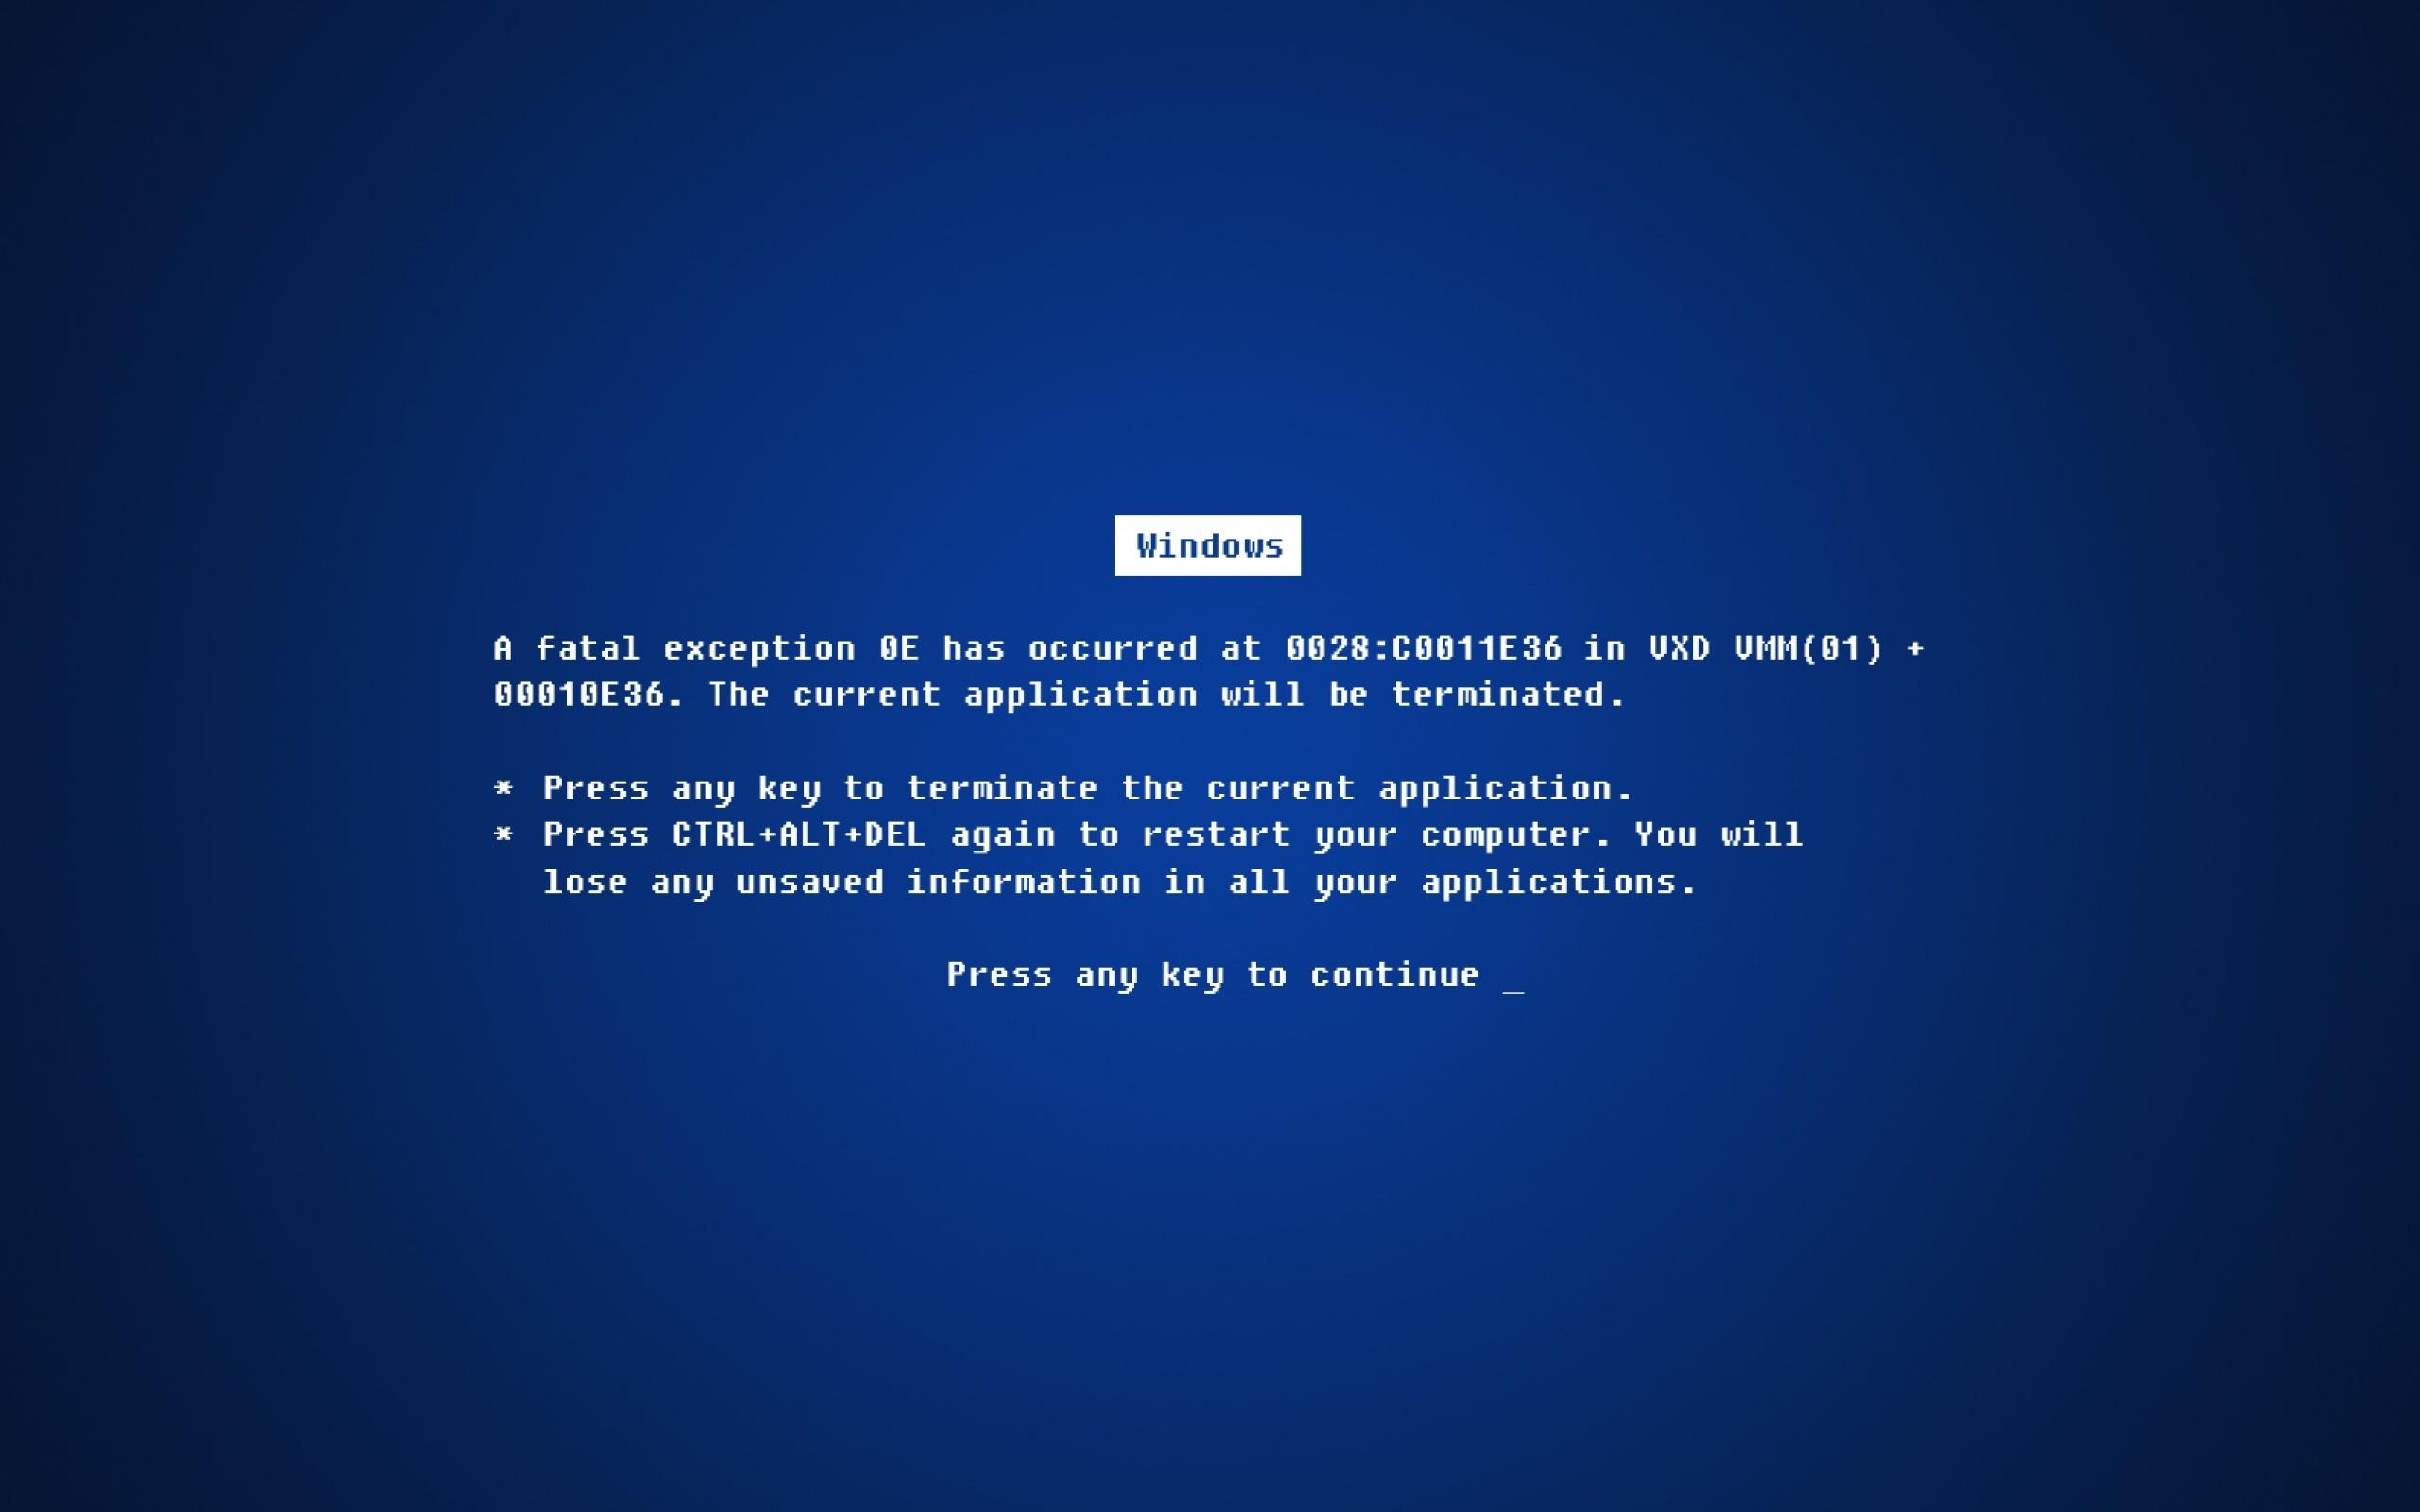 Technology - Windows  Humor Funny Error Blue Word Wallpaper